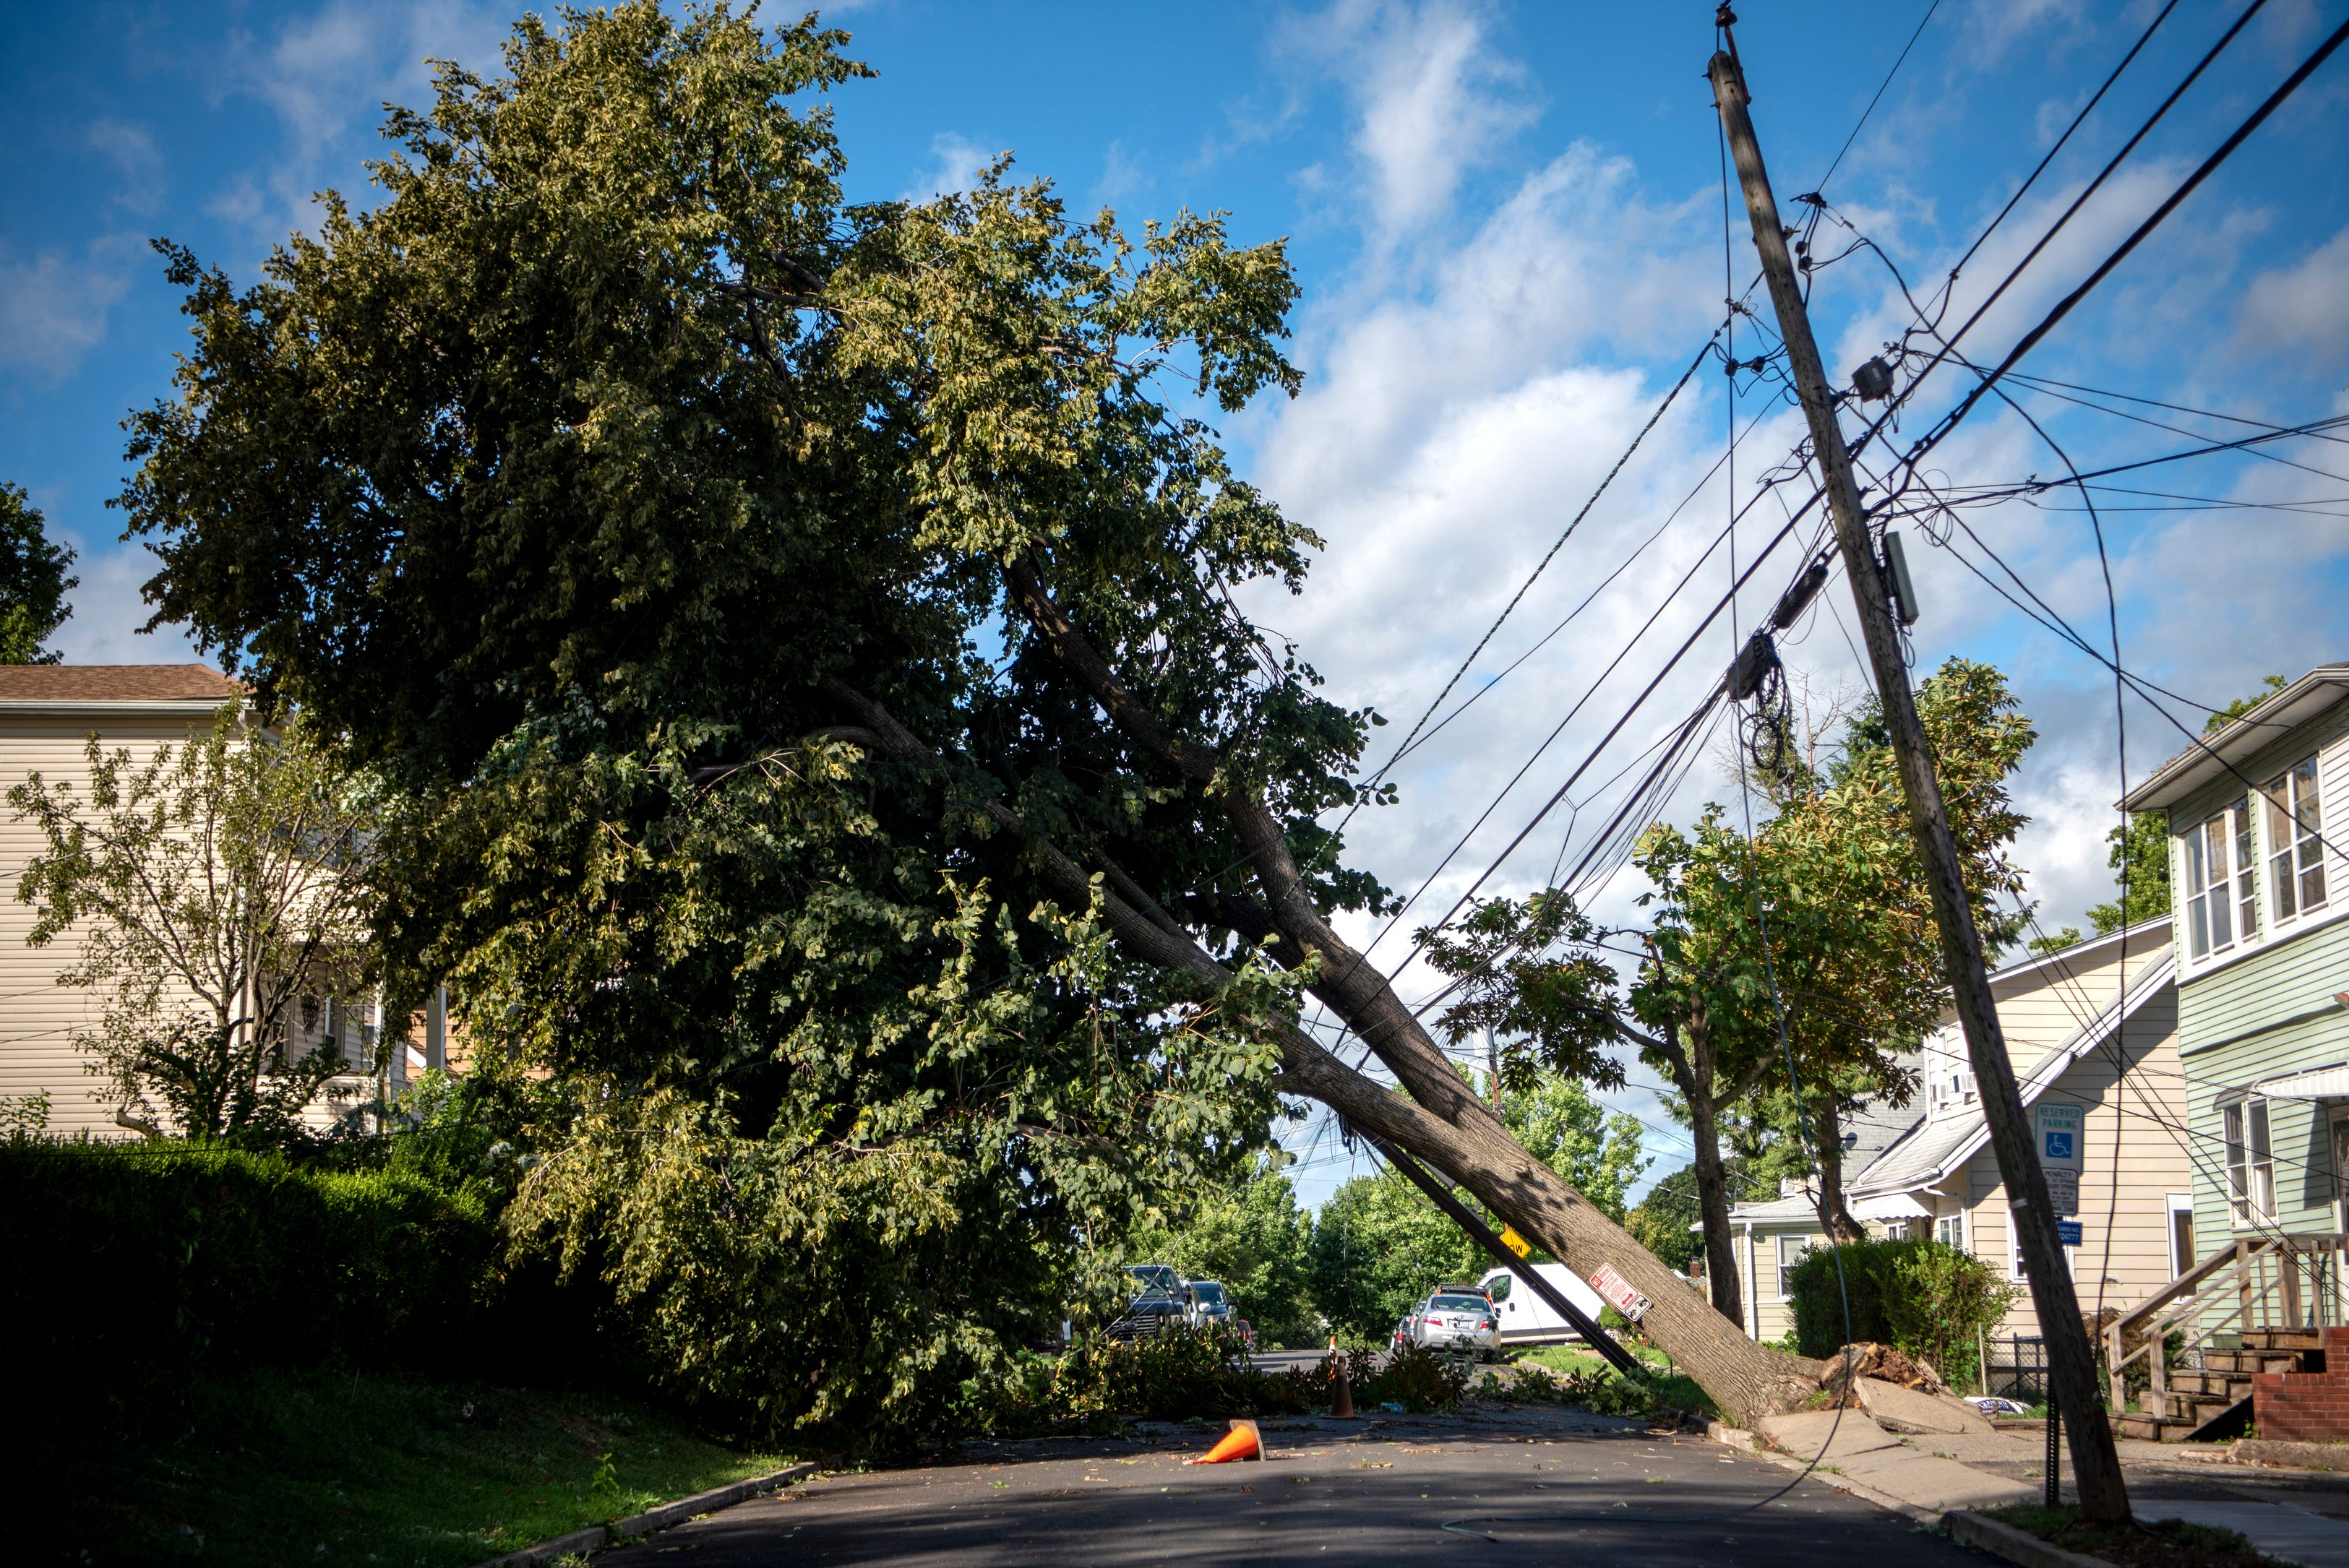 Hurricane Isaias: Hurricane activity will continue as season nears...